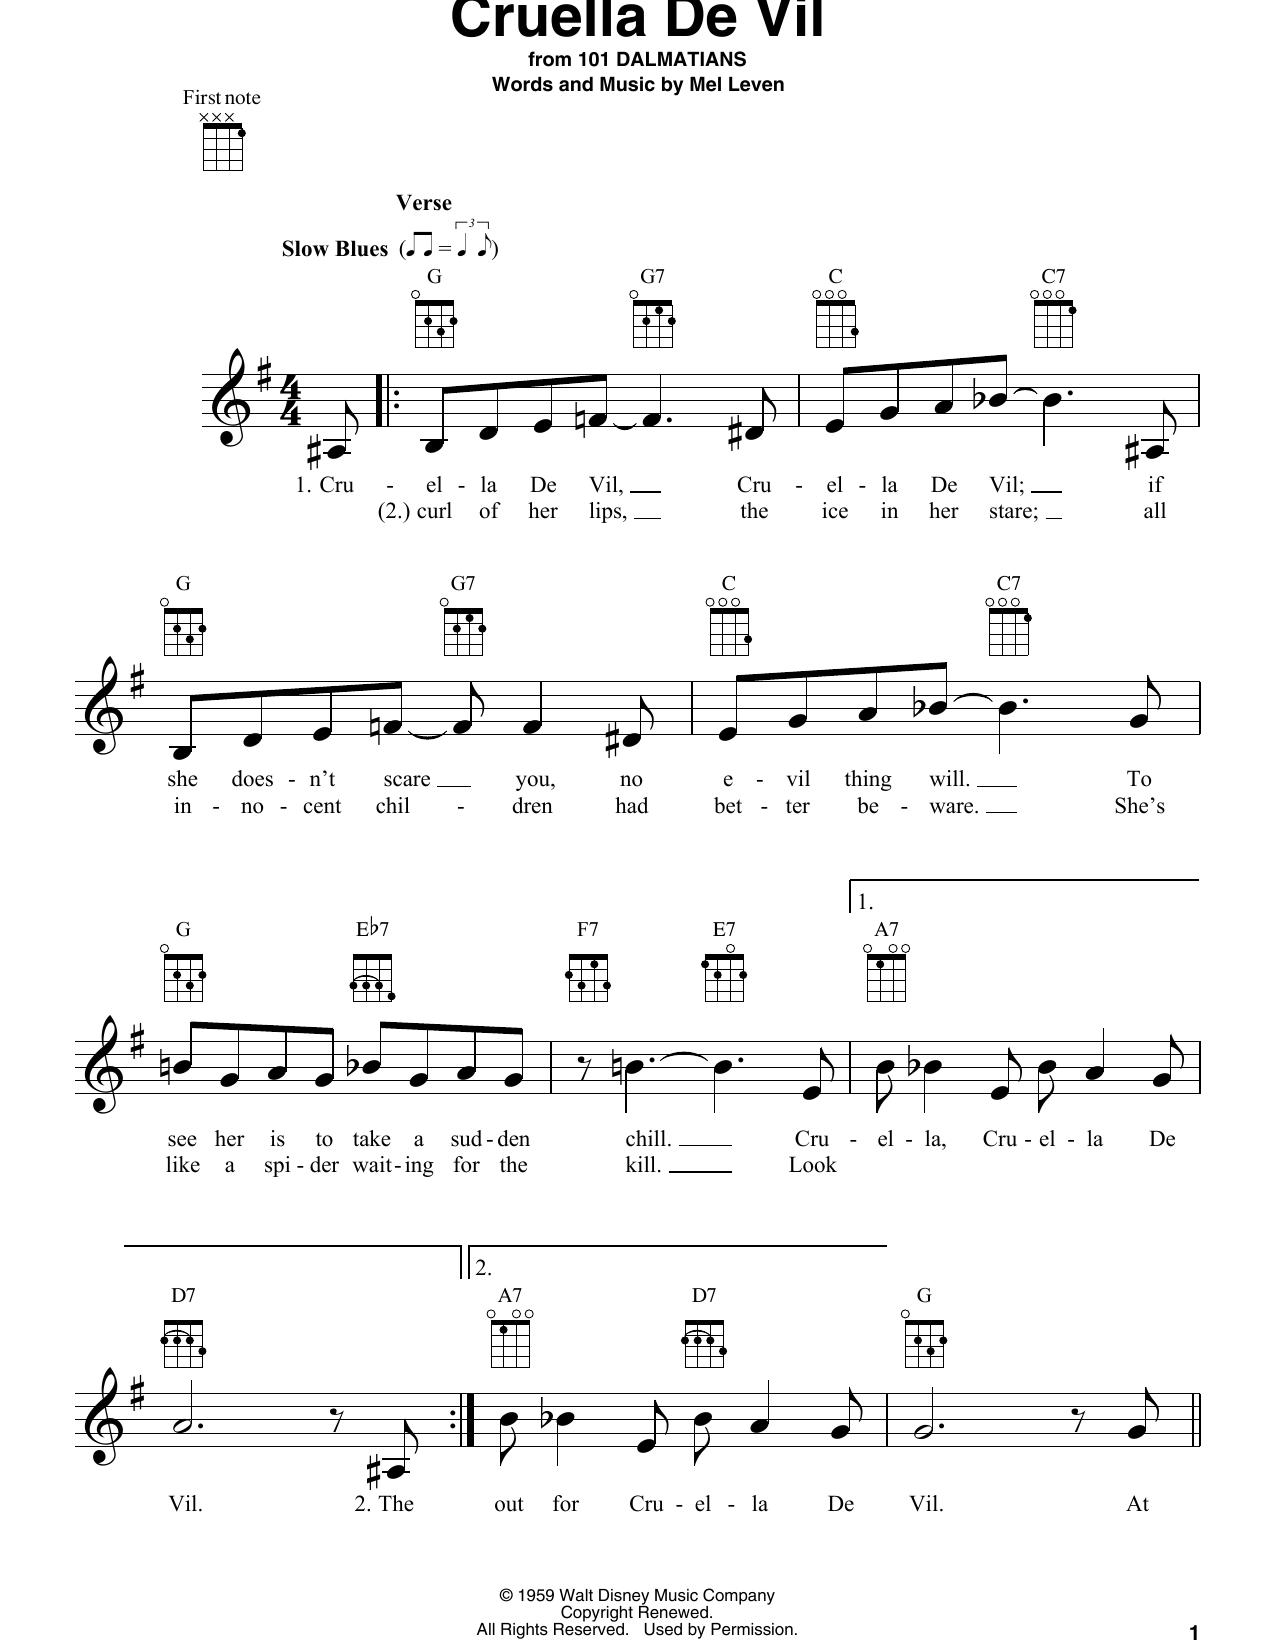 Cruella De Vil Sheet Music